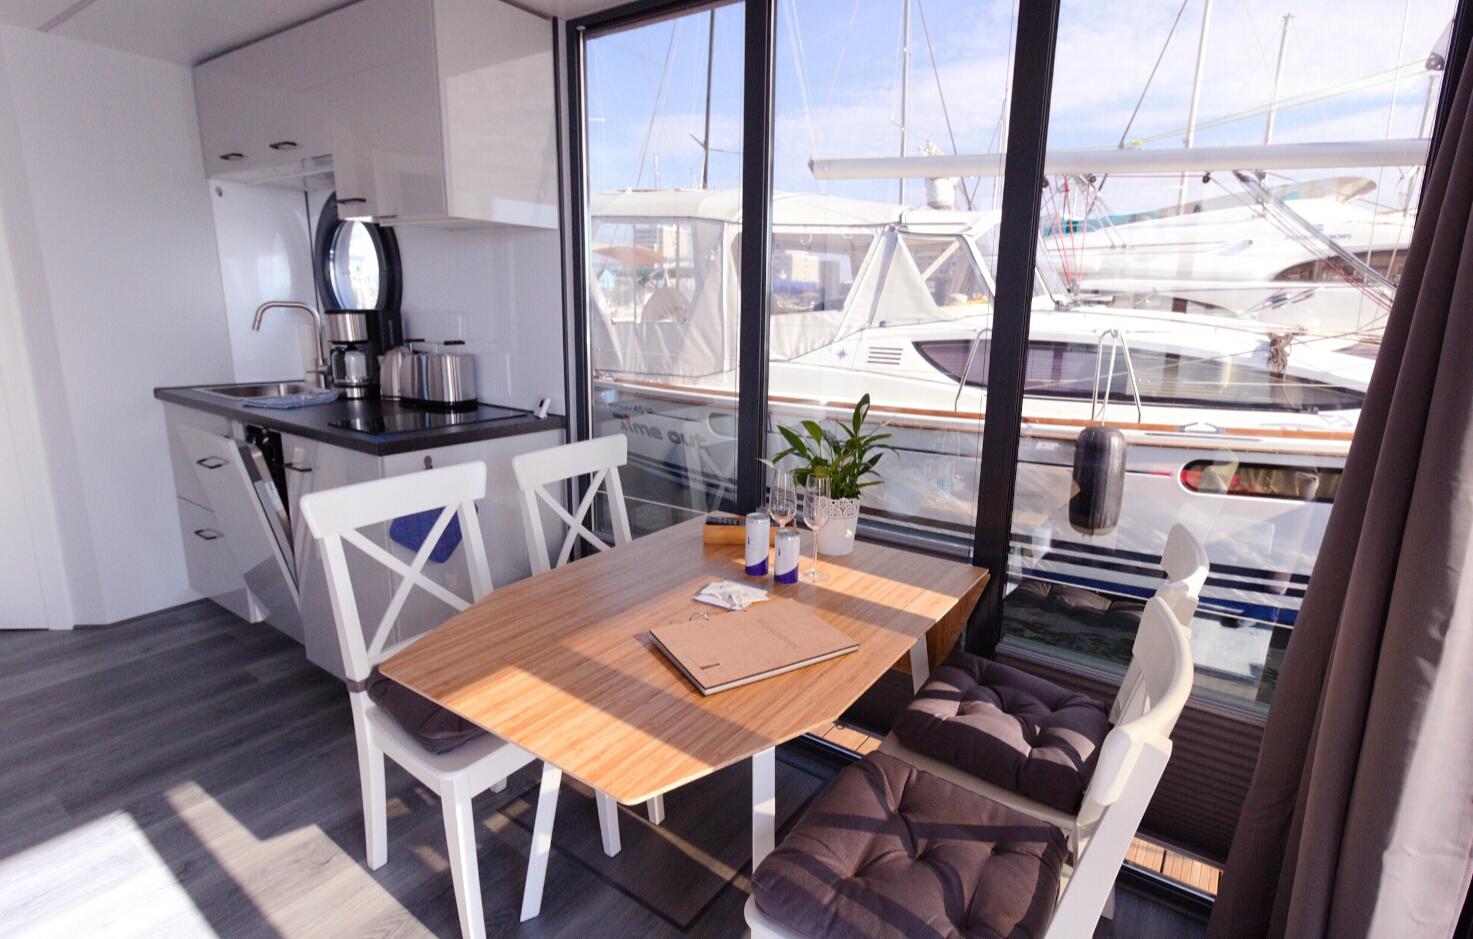 hausboot-uebernachtung-wendtorf-bg2